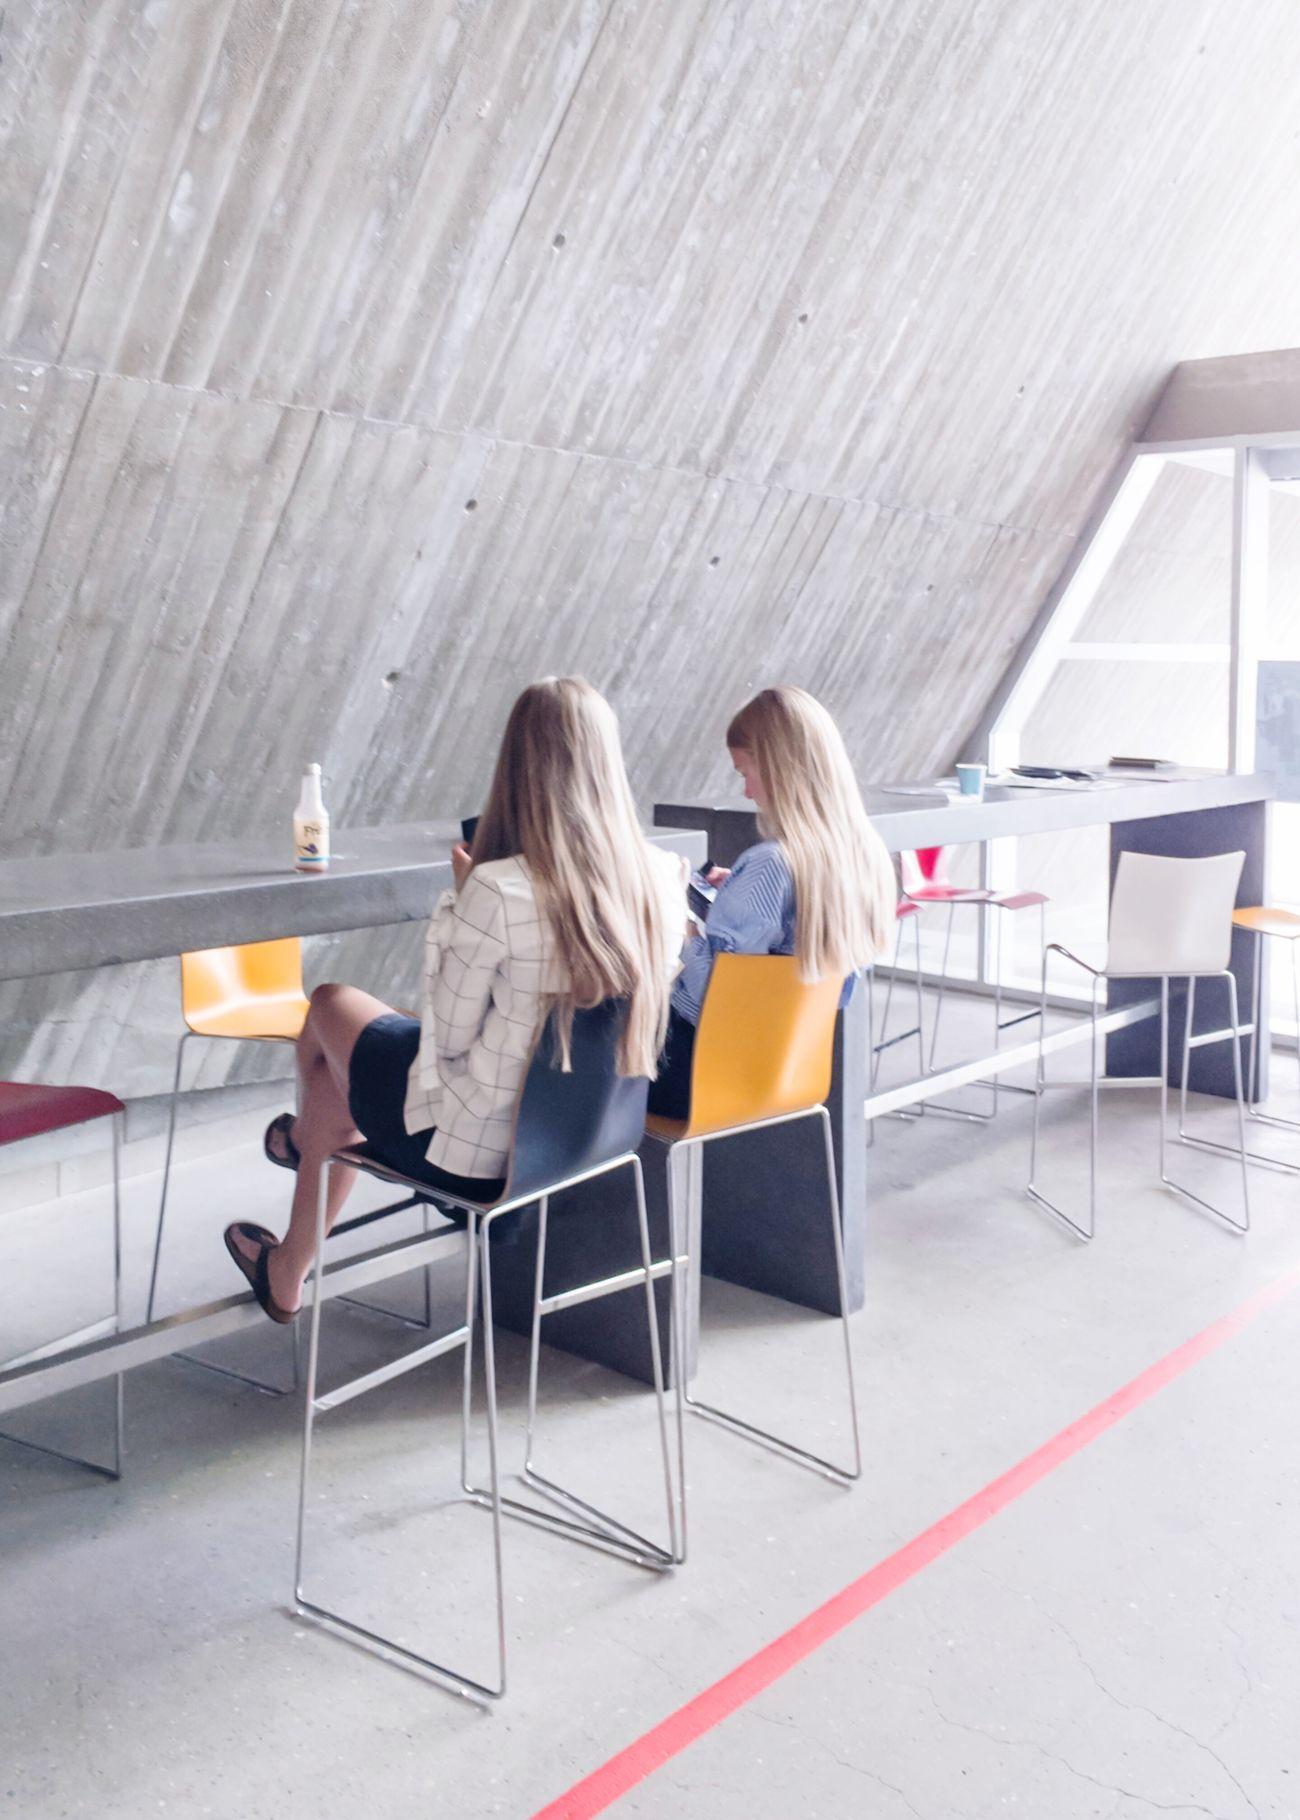 Sitting Indoors  Women Blond Hair Chair Young Women Friendship People Iphonese Concrete Interior Design Denmark